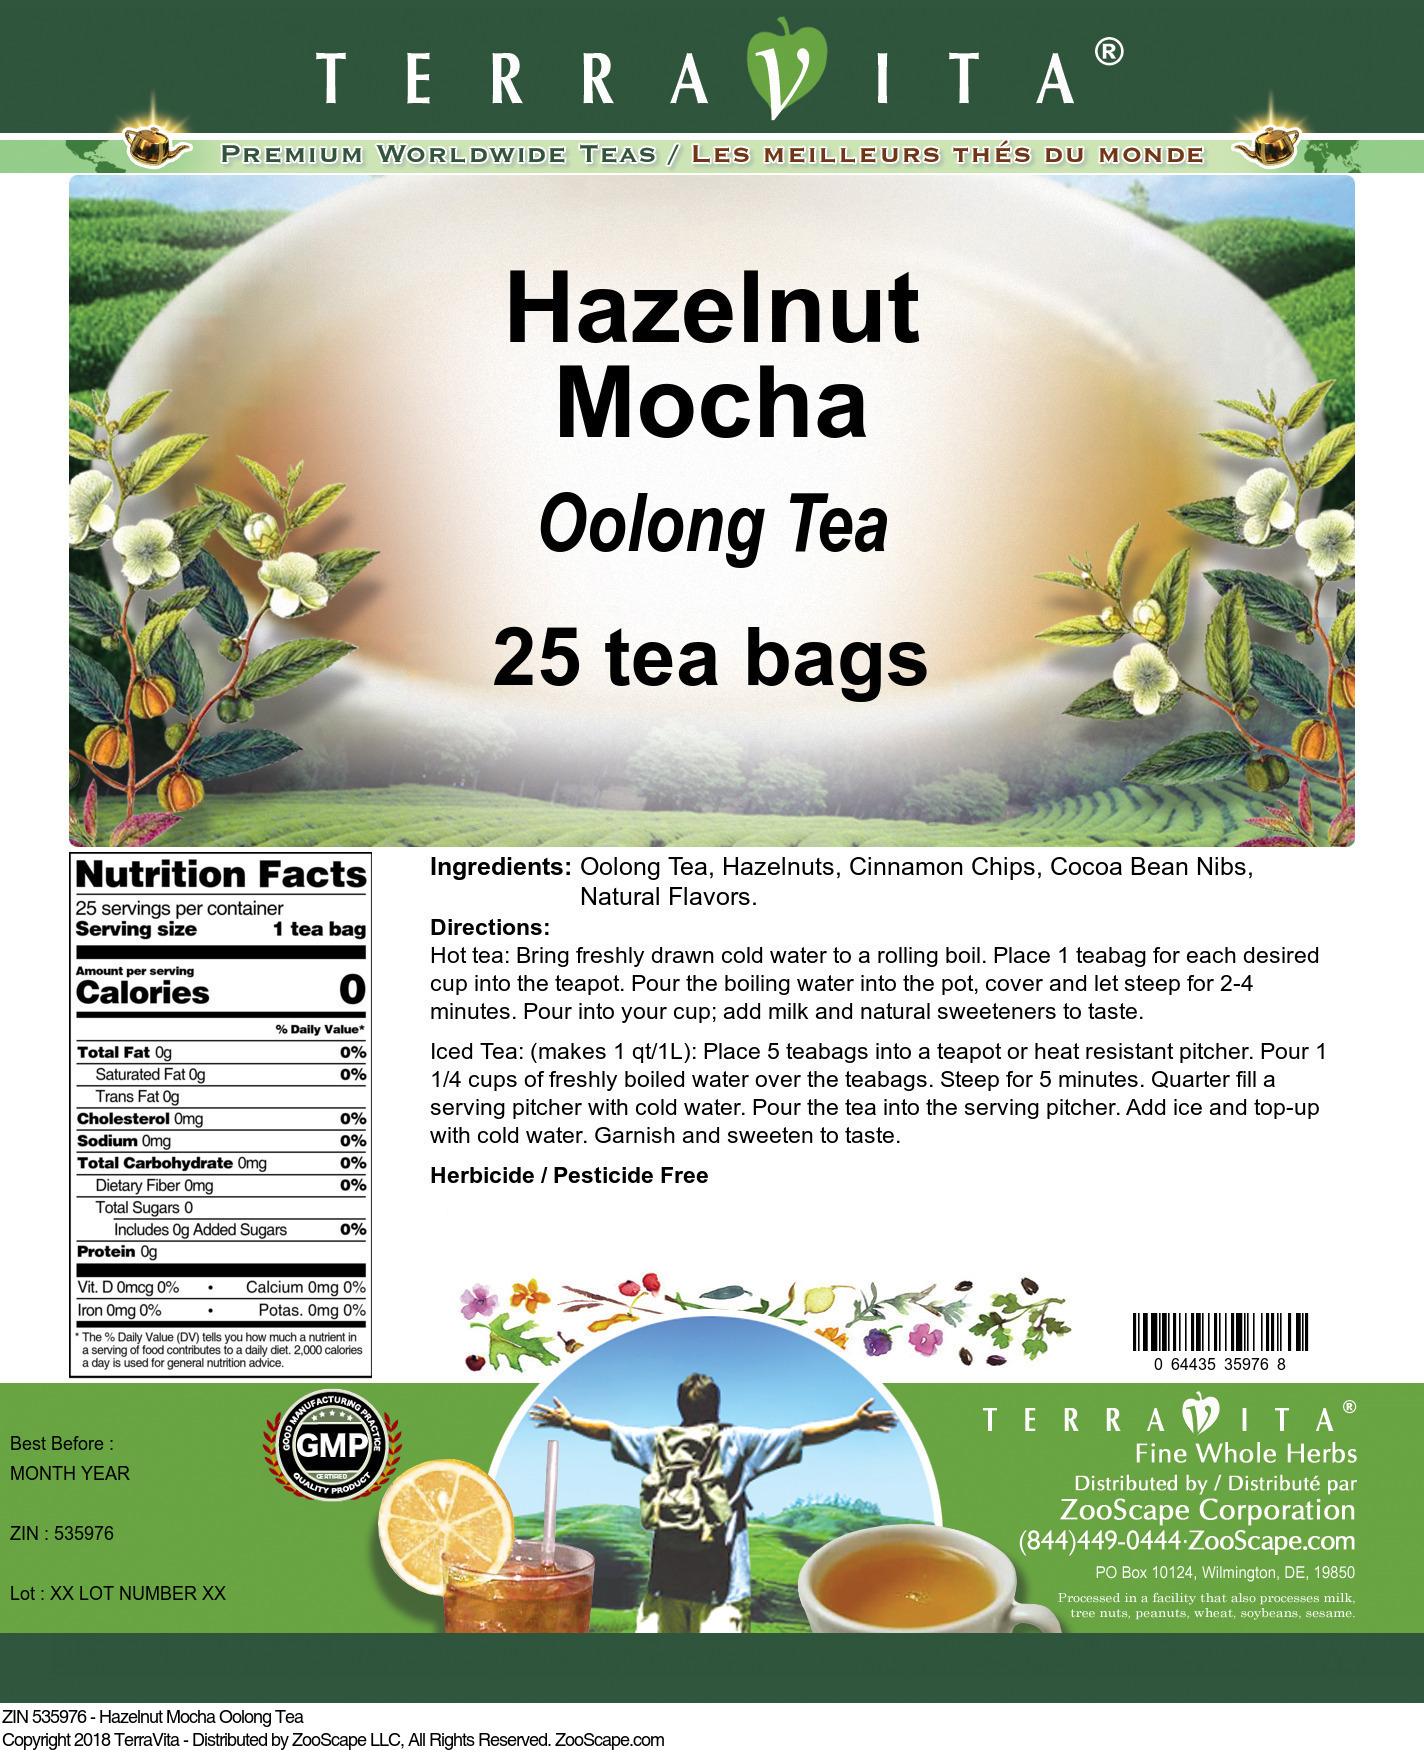 Hazelnut Mocha Oolong Tea